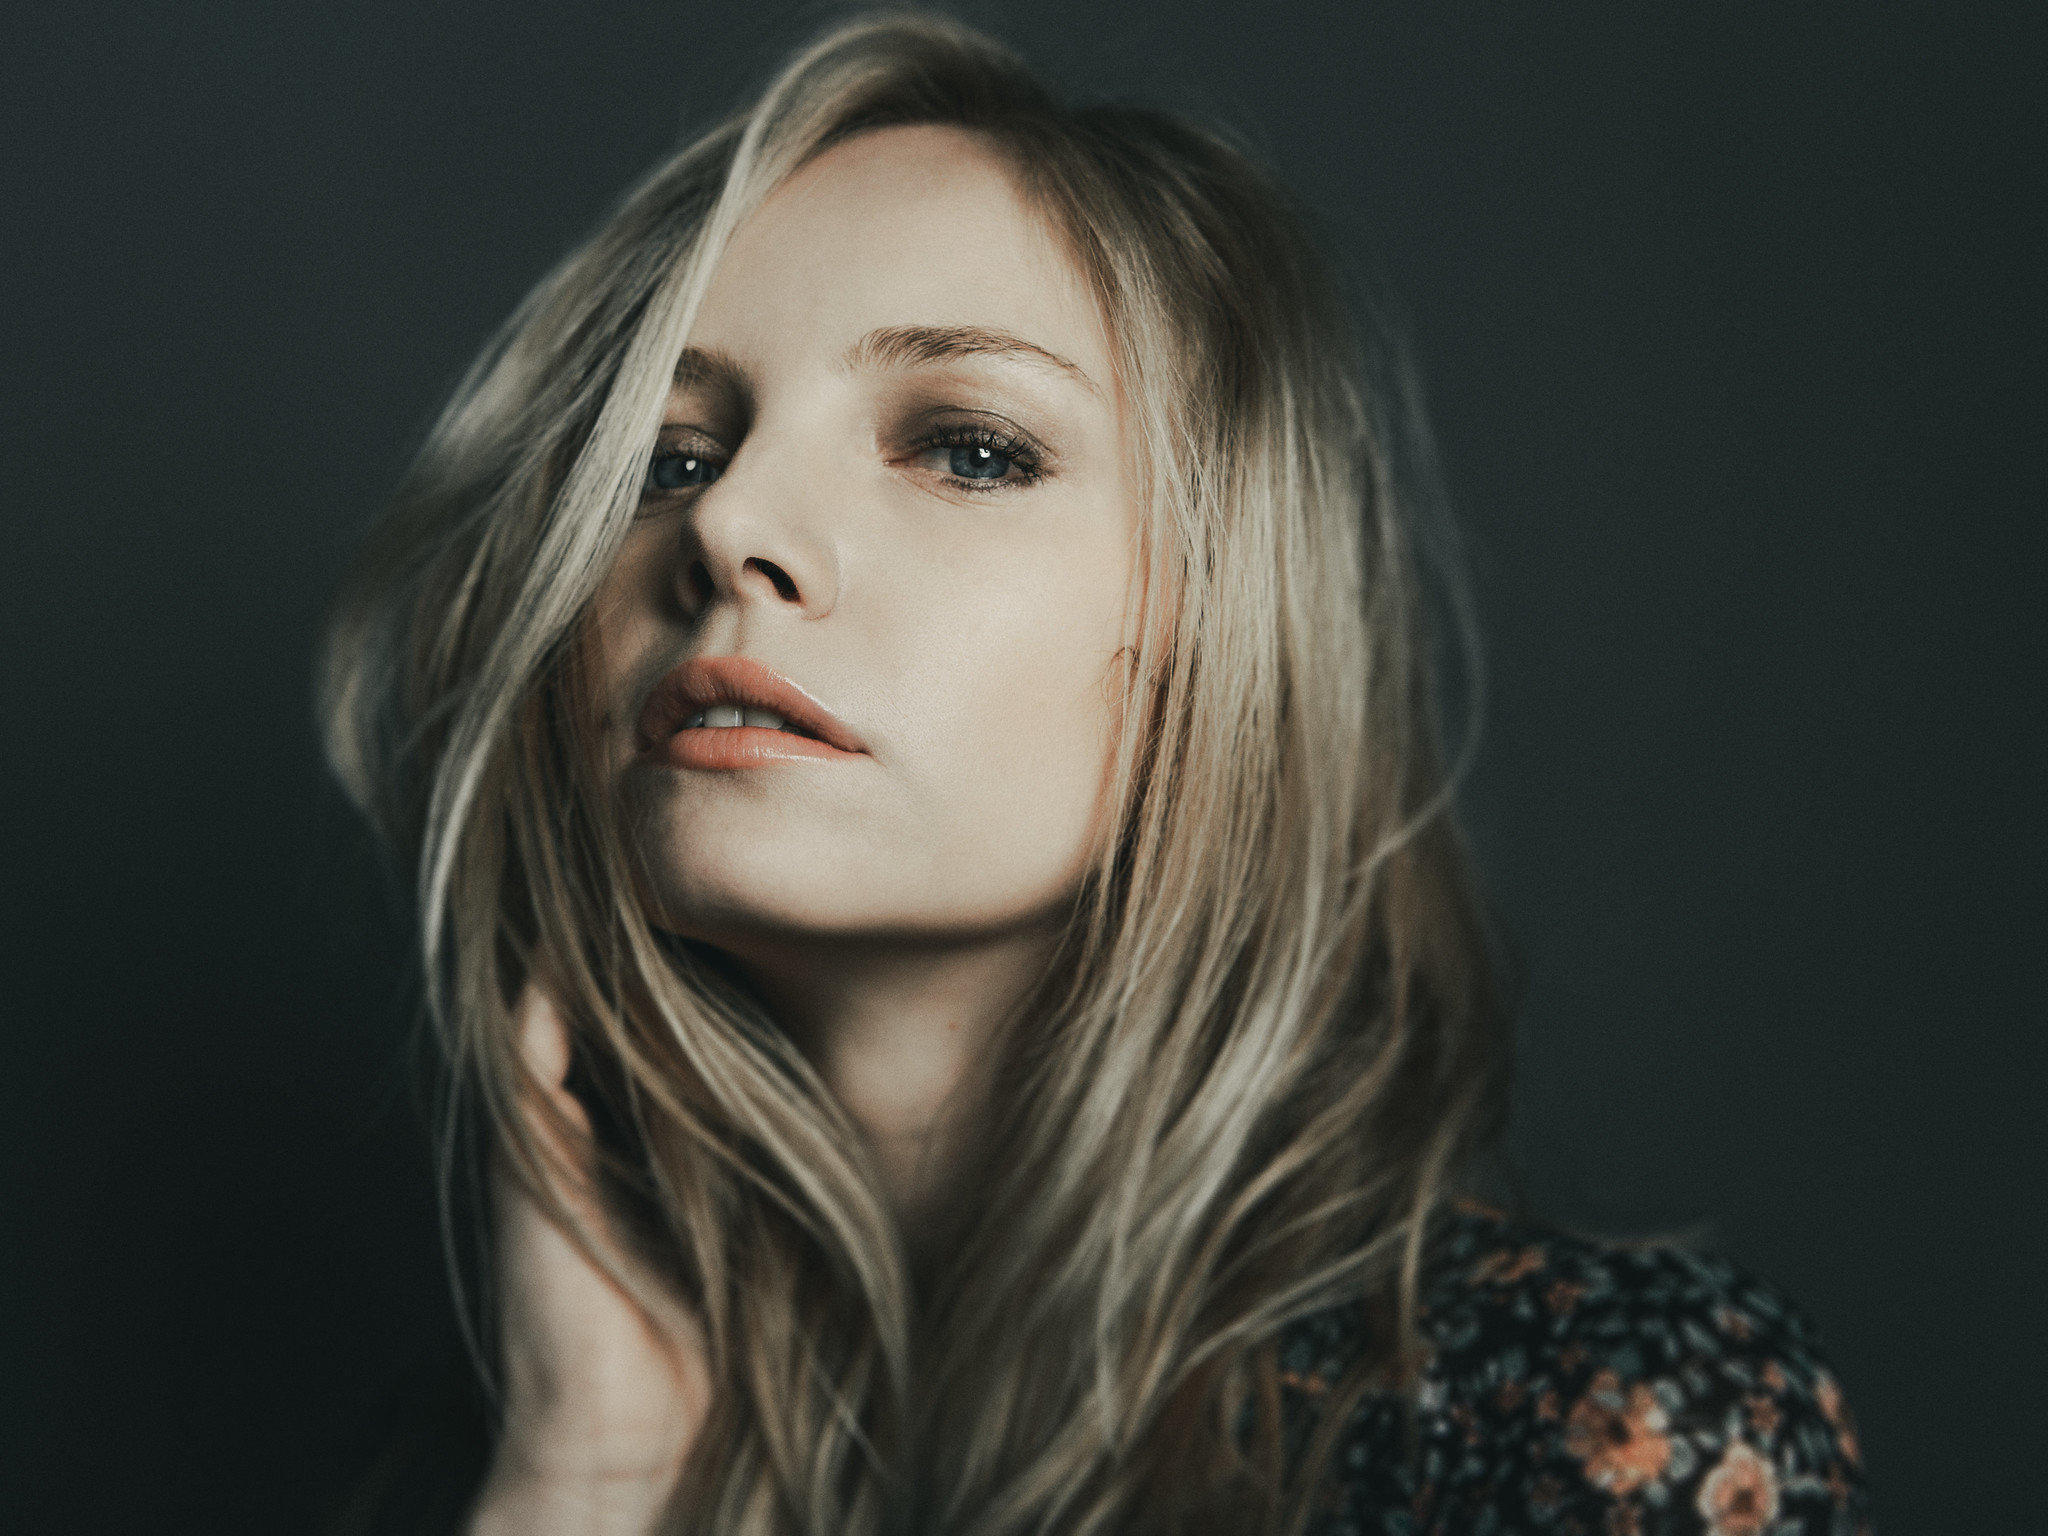 People 2048x1536 women blonde blue eyes looking at viewer hands in hair portrait Laure Massard